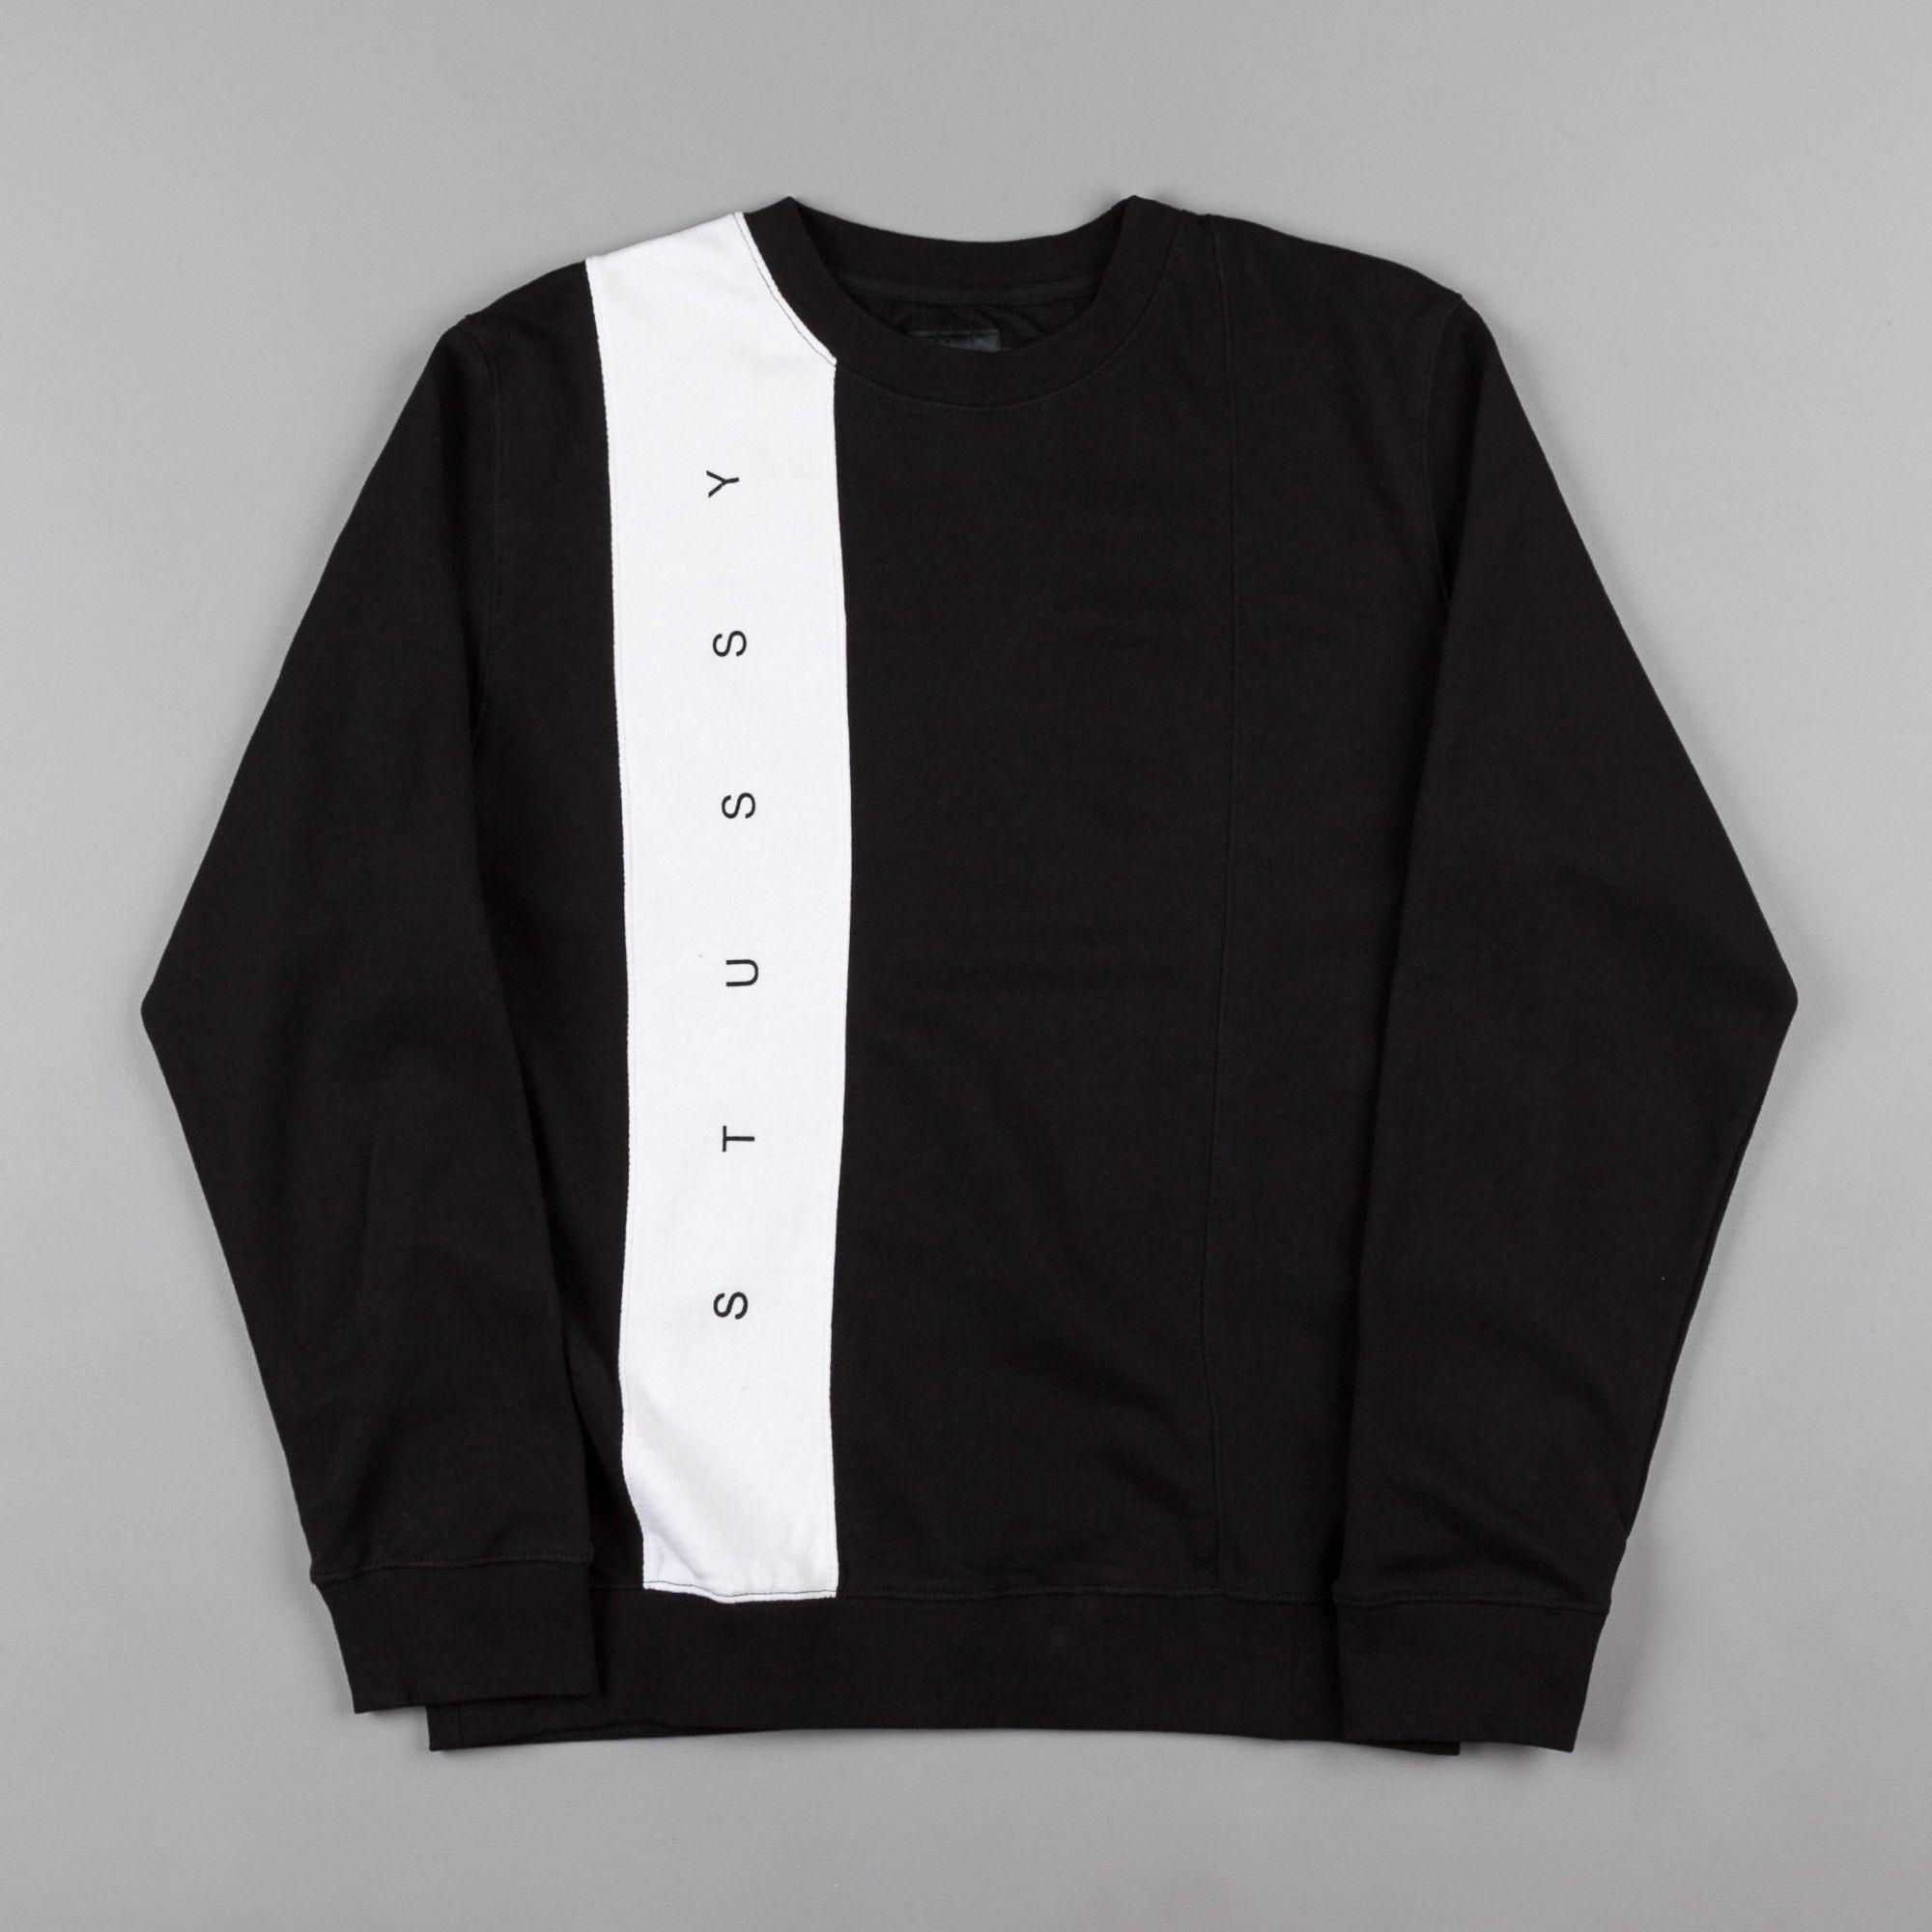 8462bfd37a8 Stussy Paneled Crewneck Sweatshirt - Black